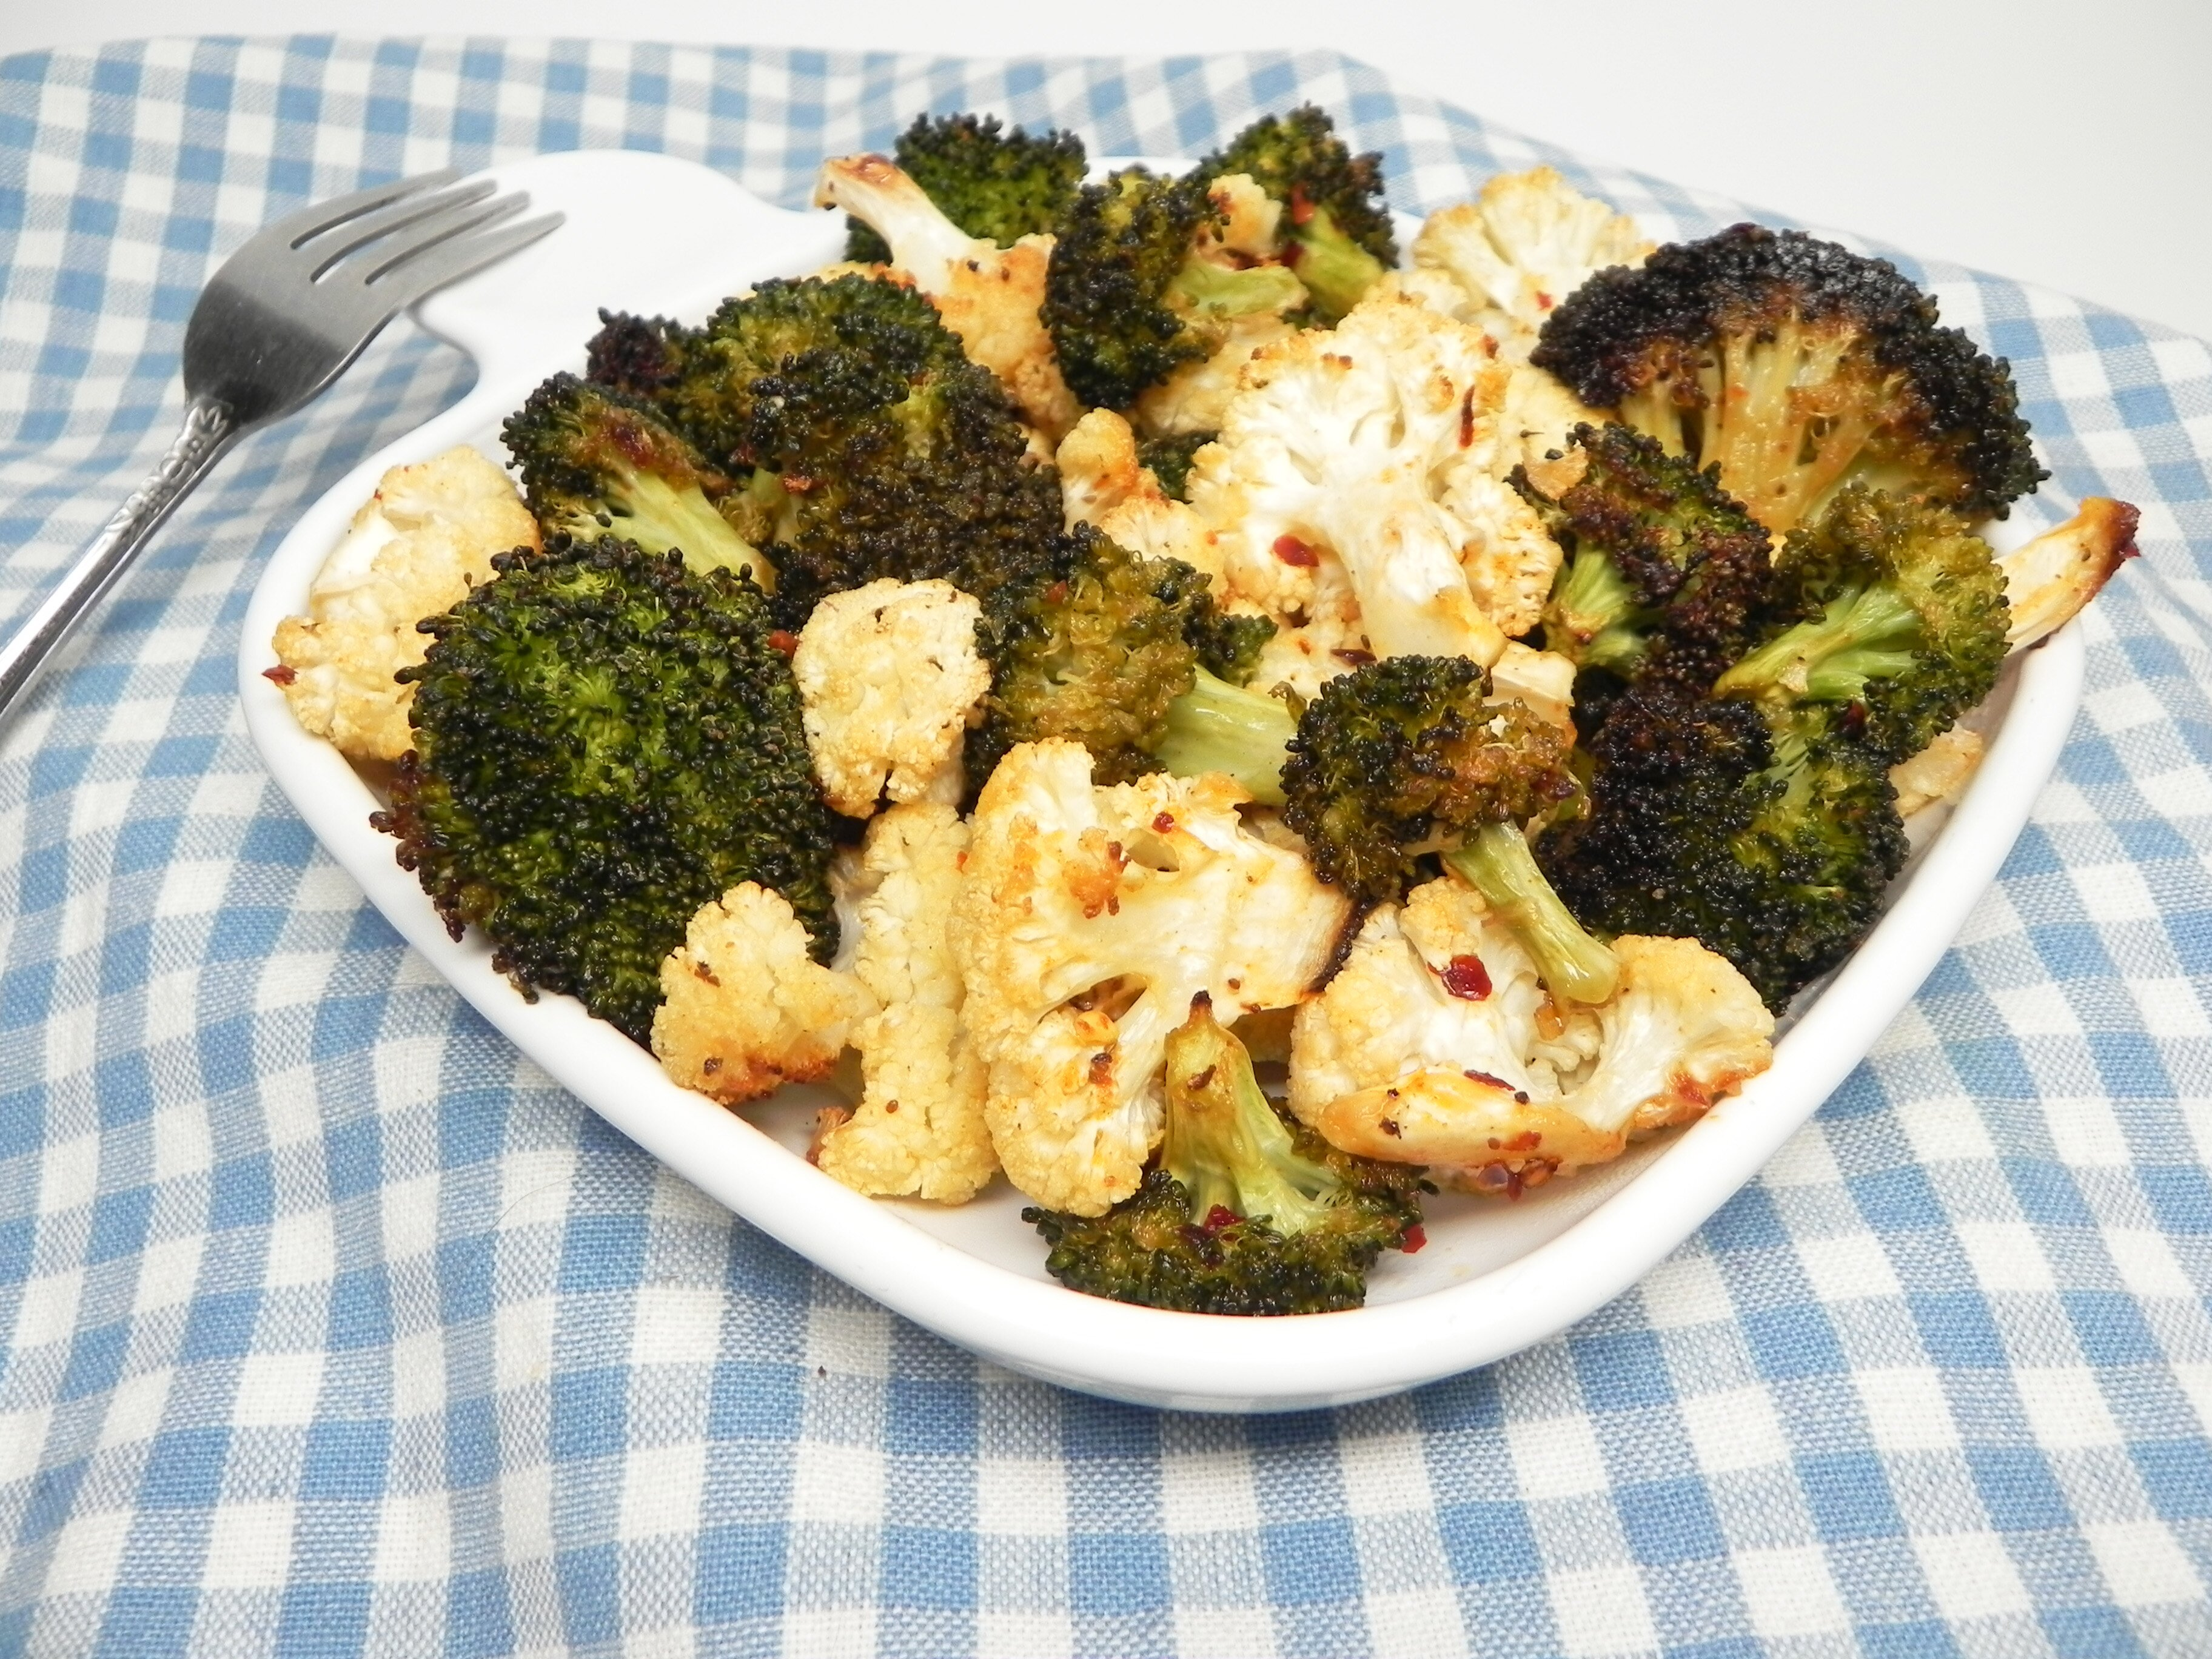 lemon pepper roasted broccoli and cauliflower